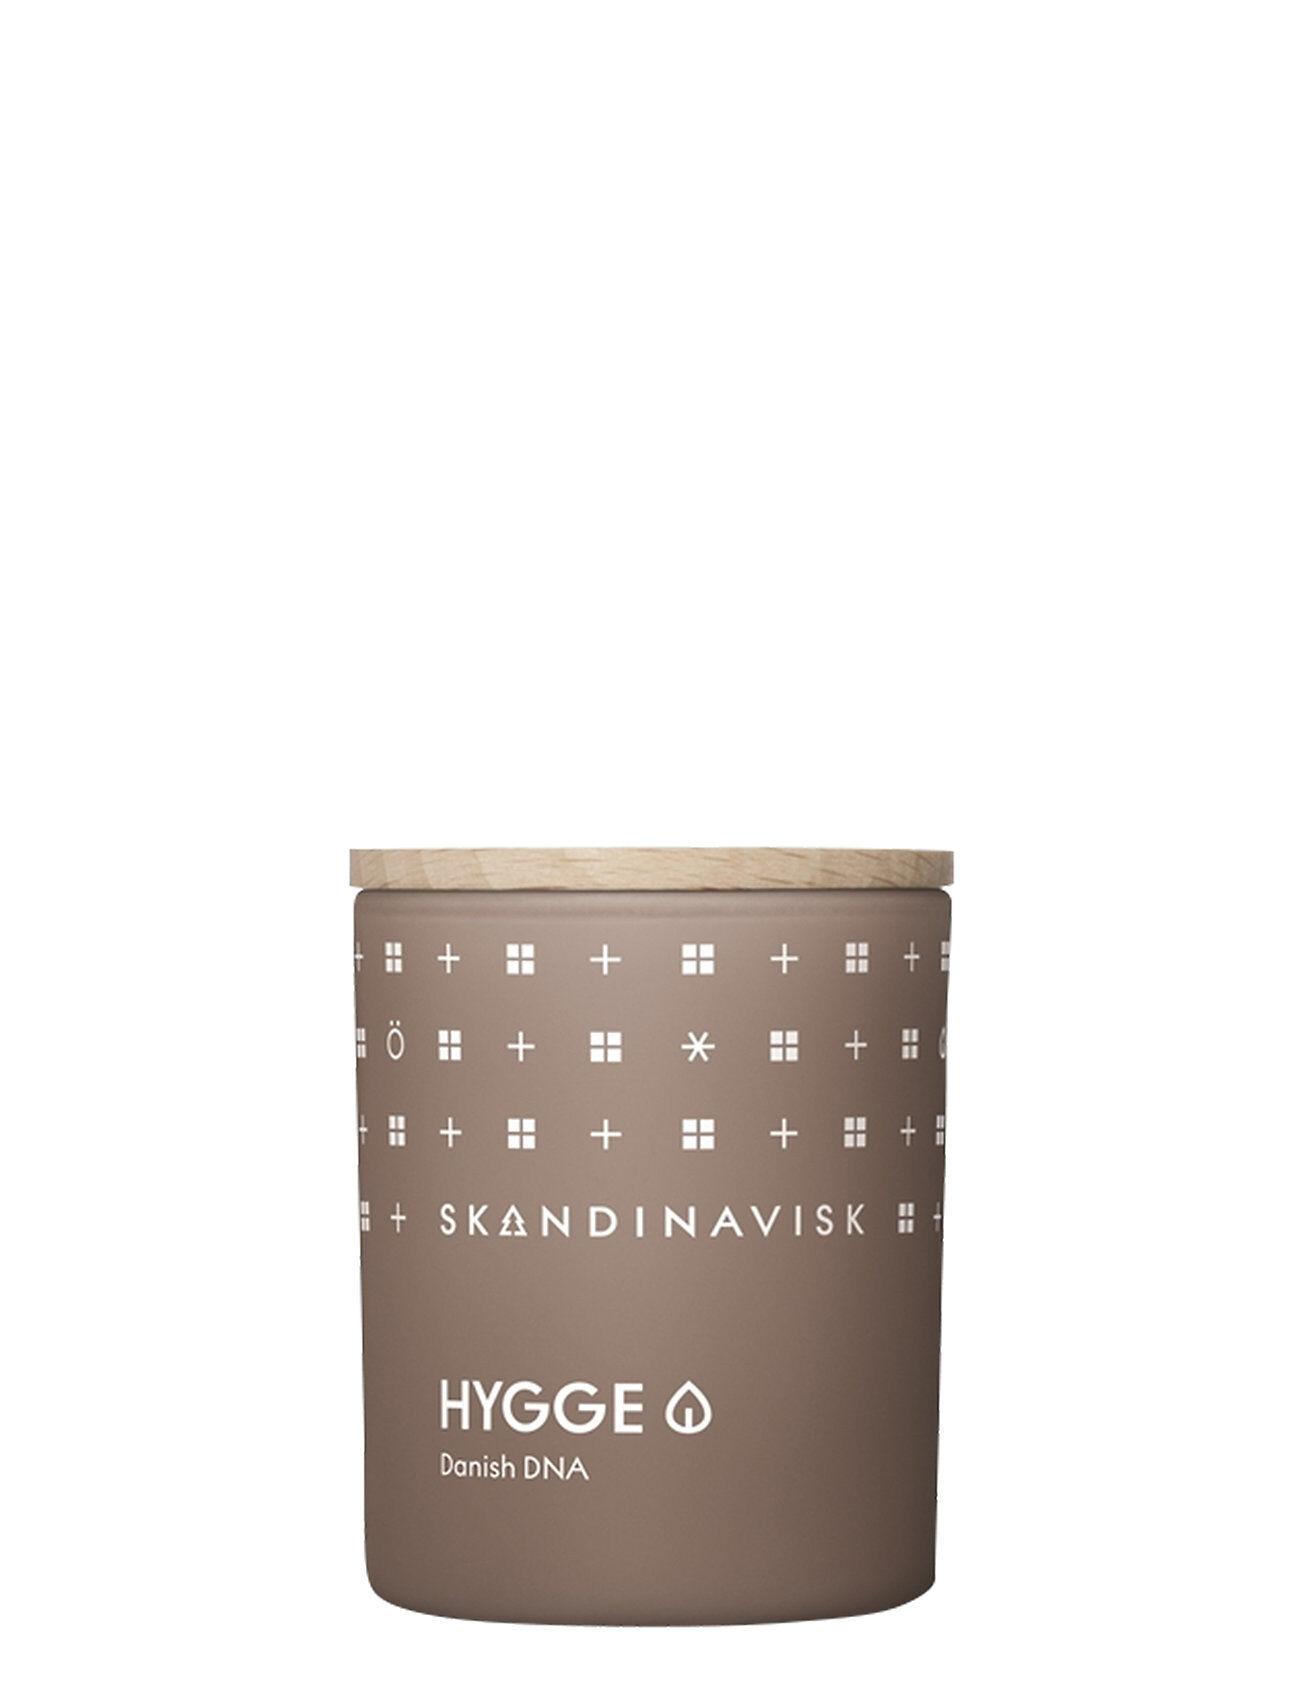 Skandinavisk Hygge Scented Candle With Lid 65g Tuoksukynttilä Nude Skandinavisk